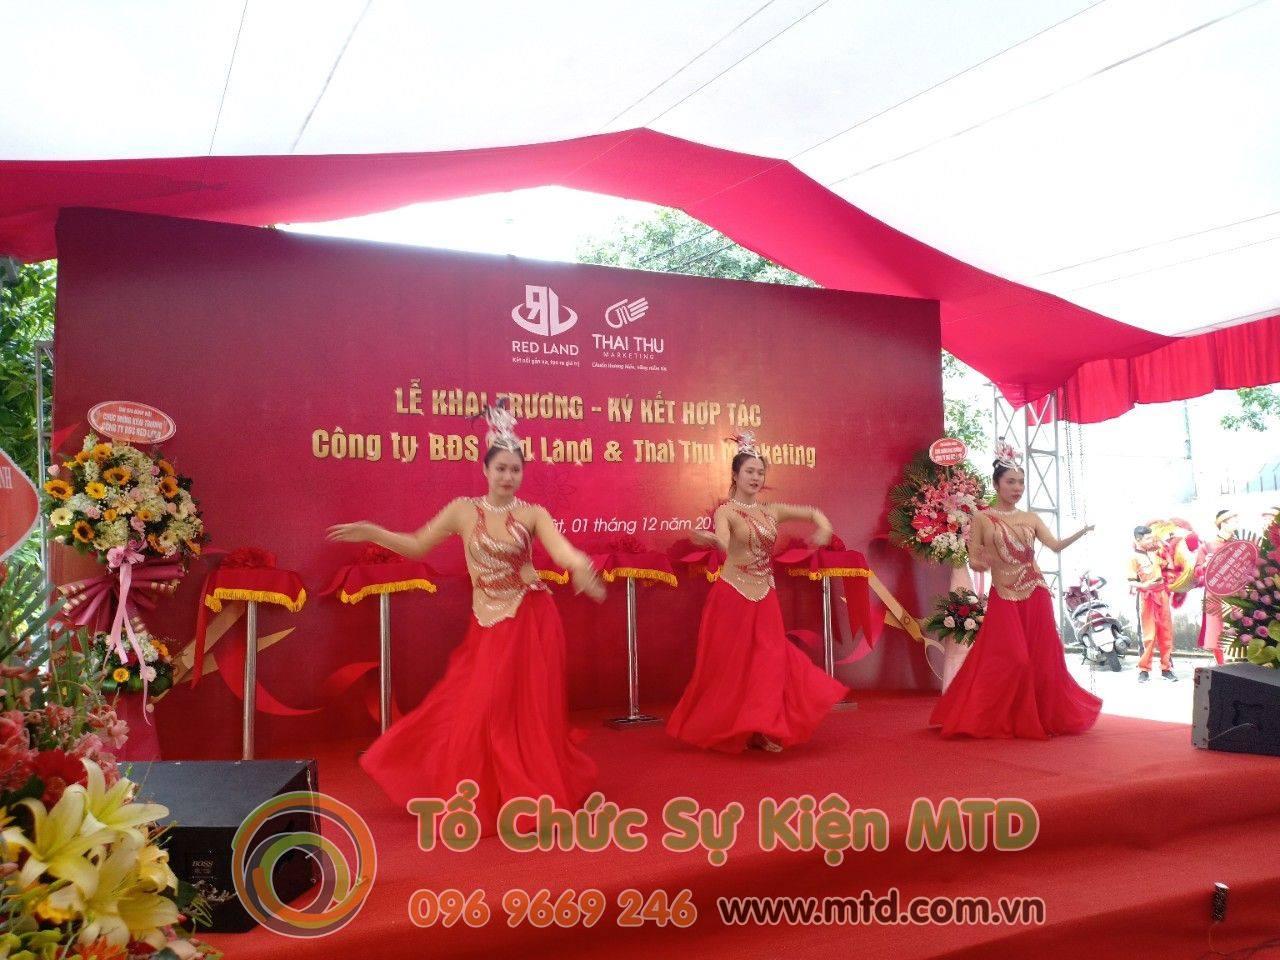 bds-red-land-vs-thai-thu-marketing-2